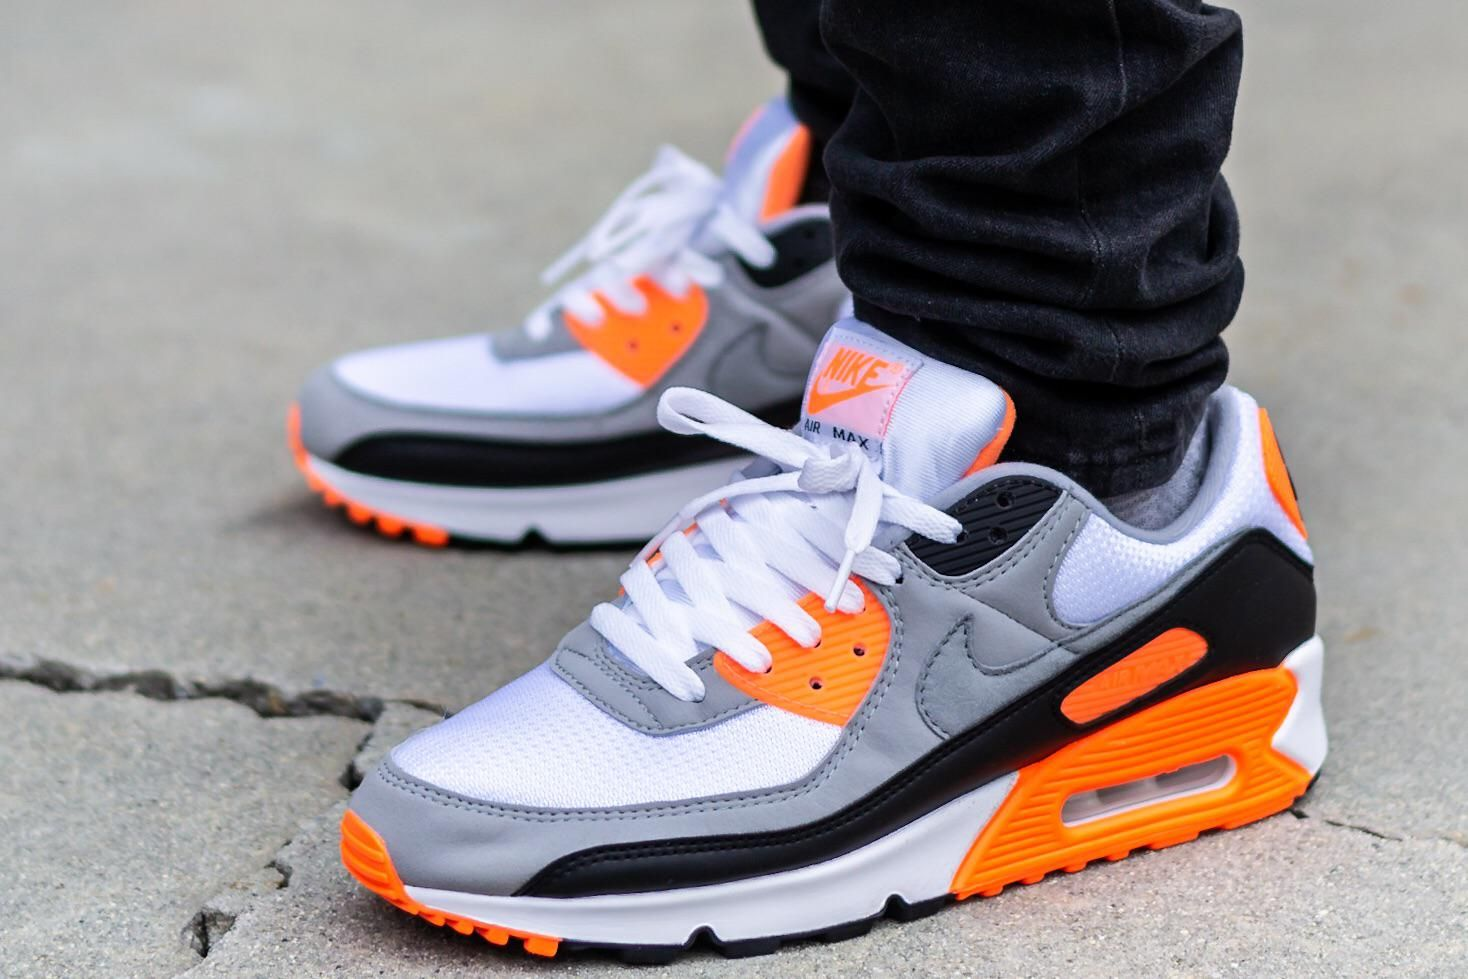 Air max 90 total orange #sneakers #sneakersfashion #sneakersoutfit ...